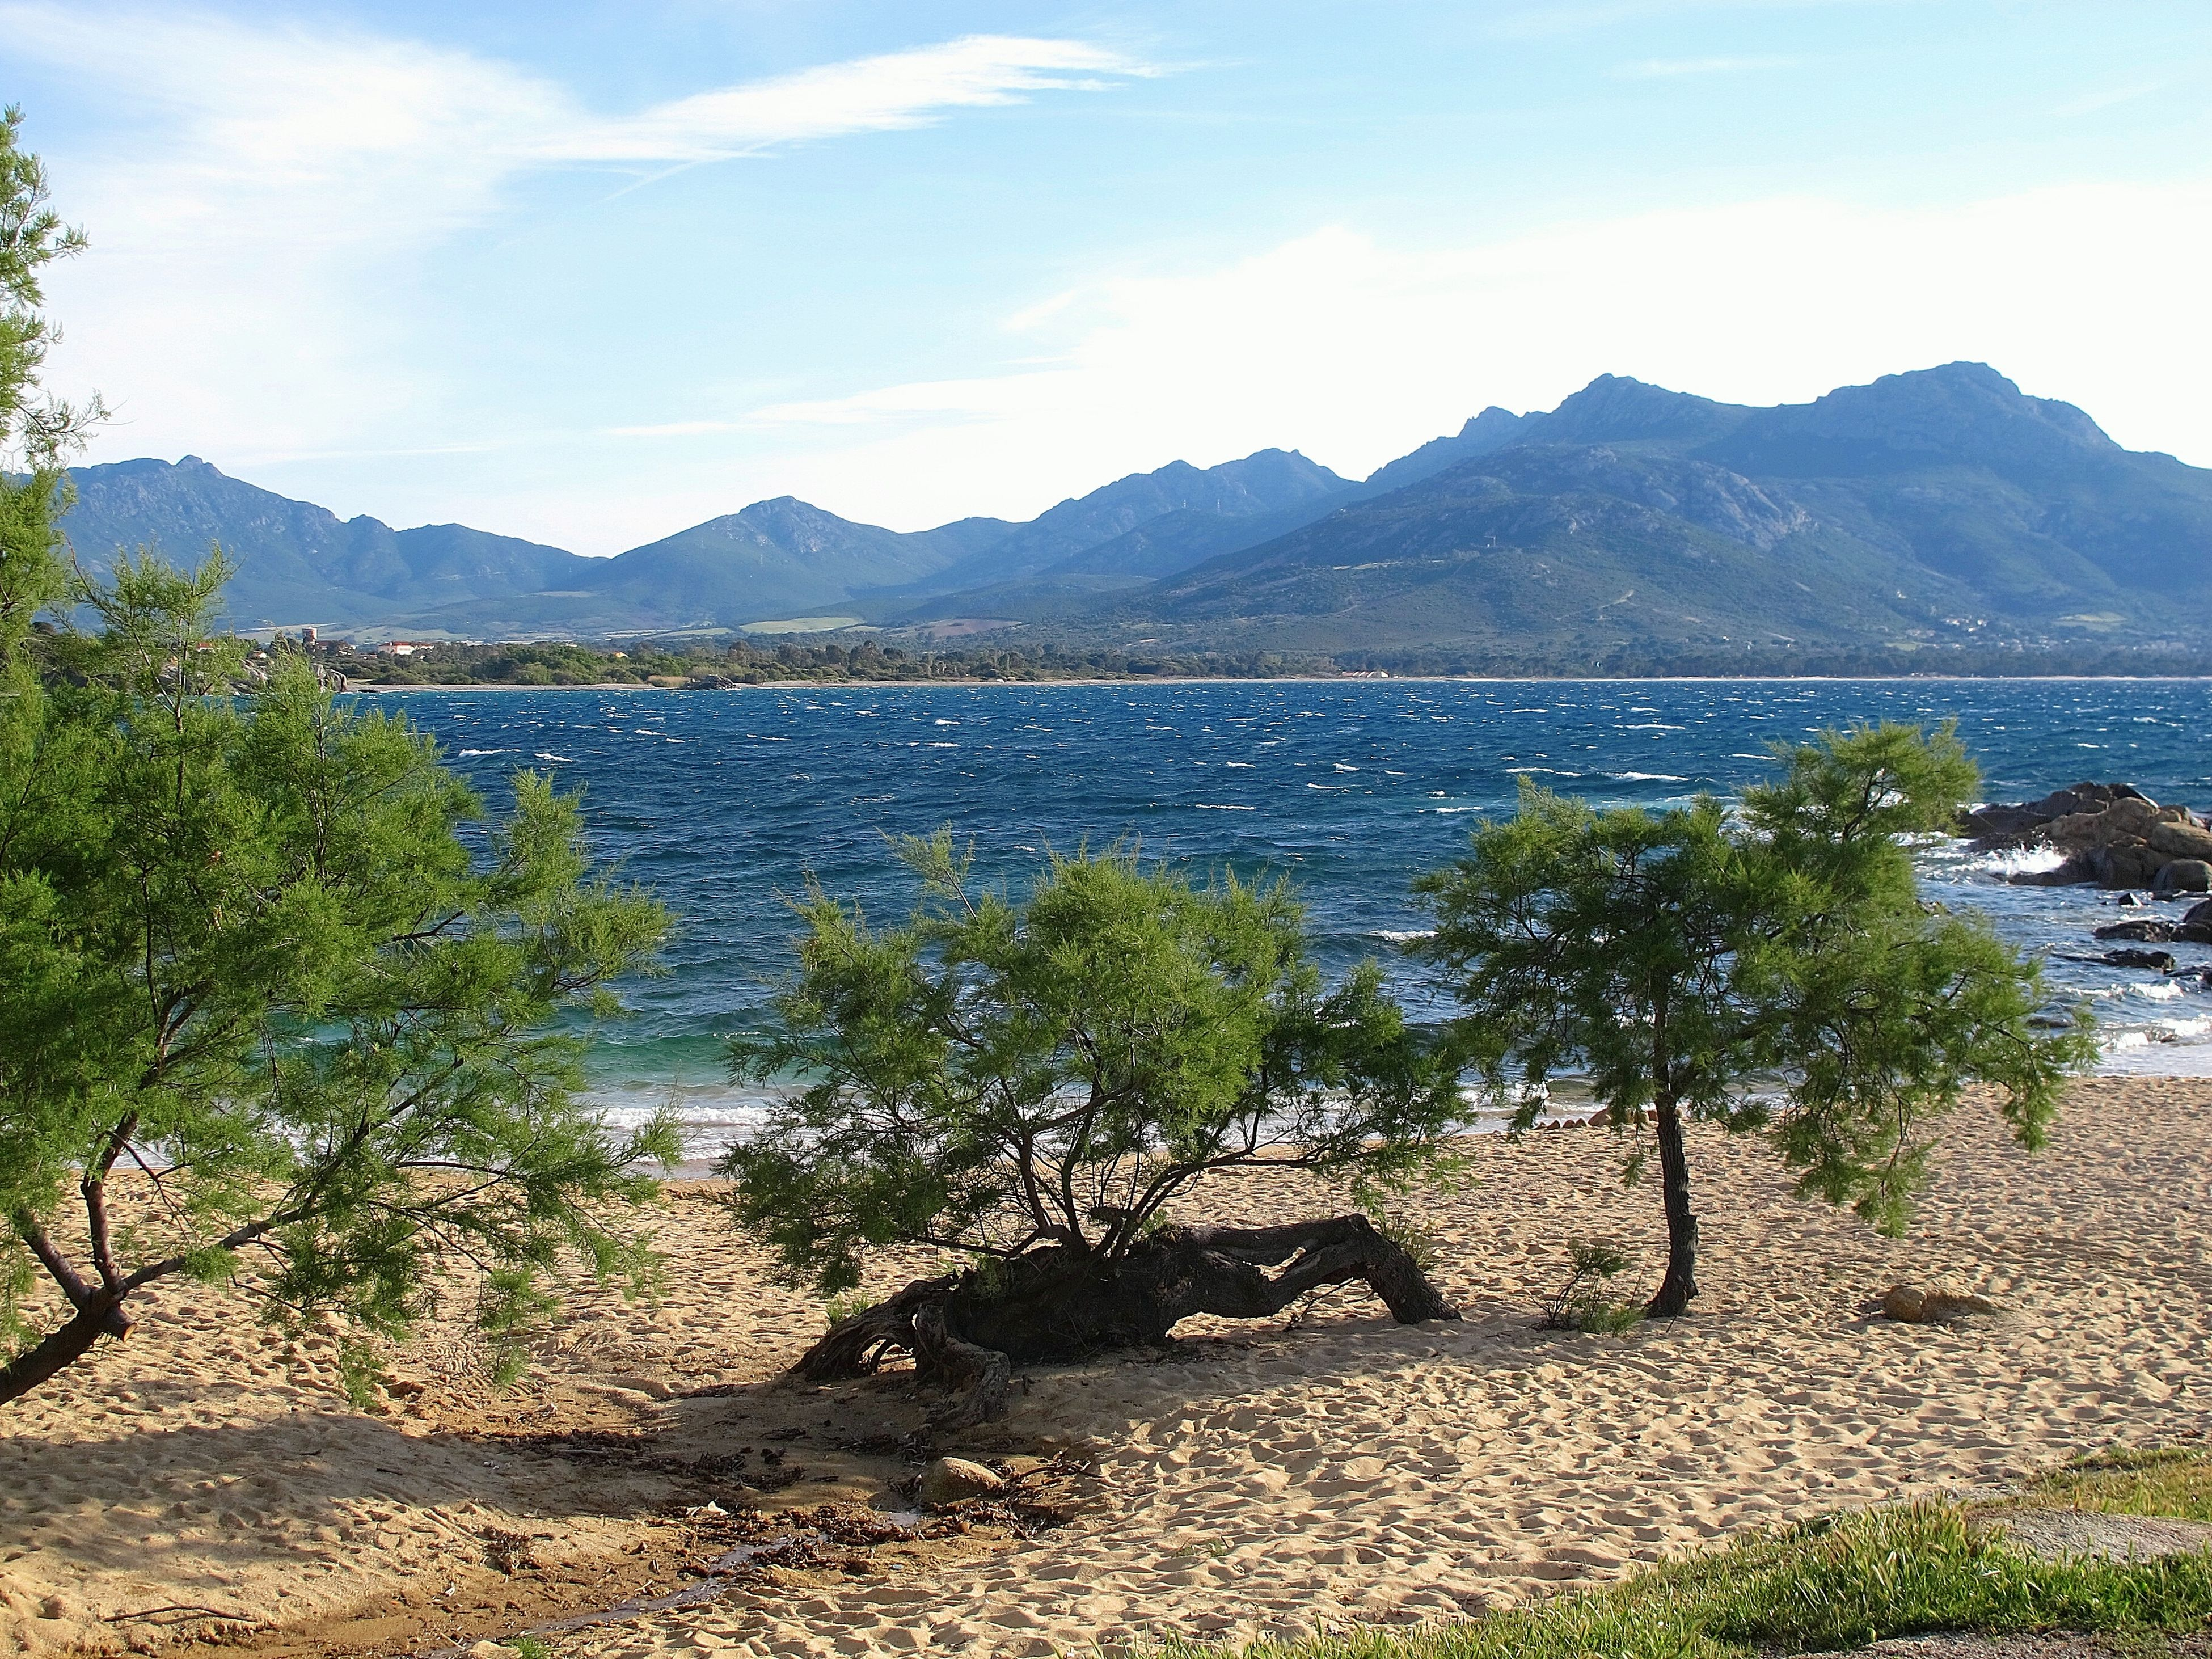 mountain, mountain range, water, tranquil scene, tranquility, scenics, sky, beauty in nature, nature, sea, lake, beach, idyllic, shore, coastline, tree, cloud - sky, non-urban scene, outdoors, cloud